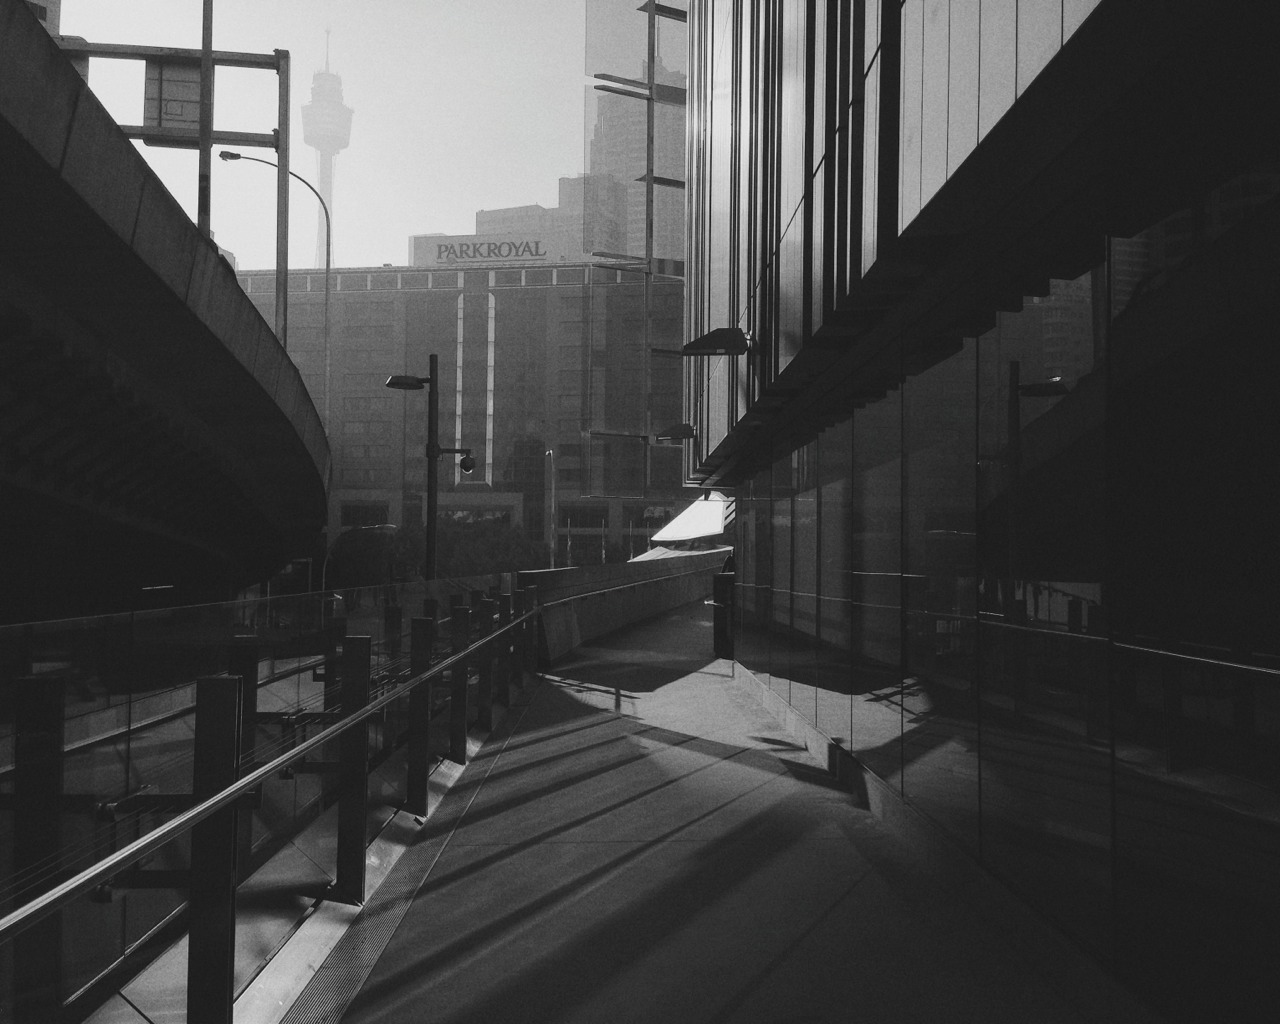 #sydney #bw #architecture